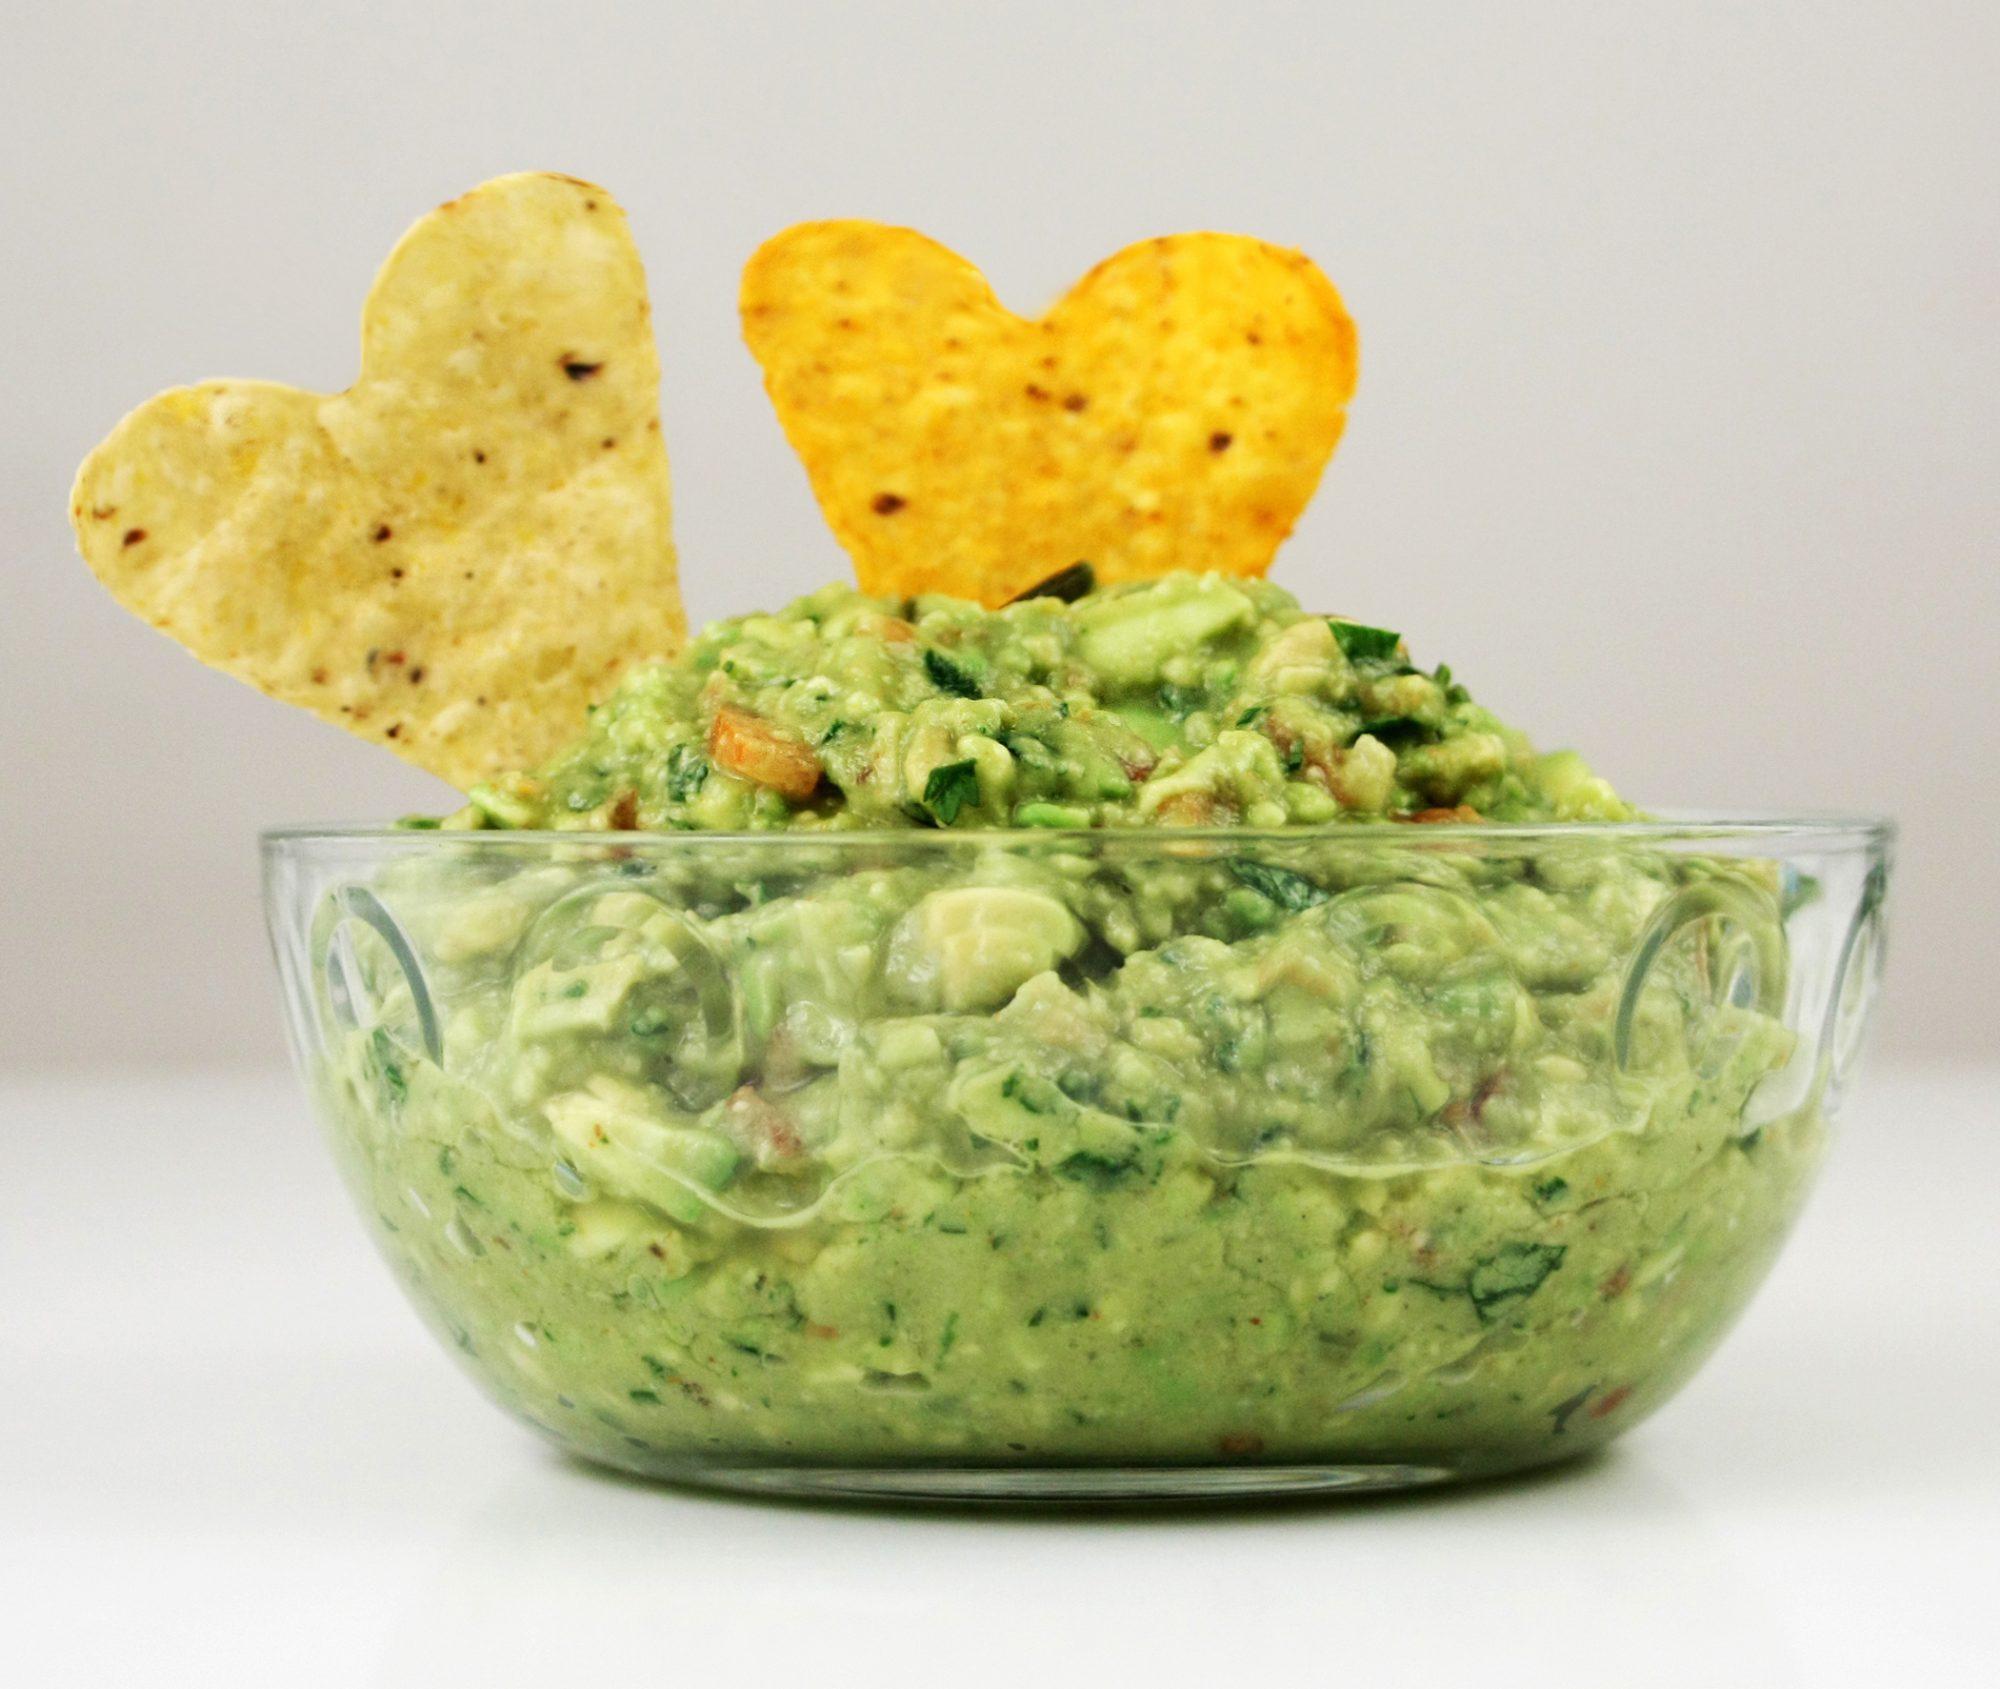 Heart shape chips